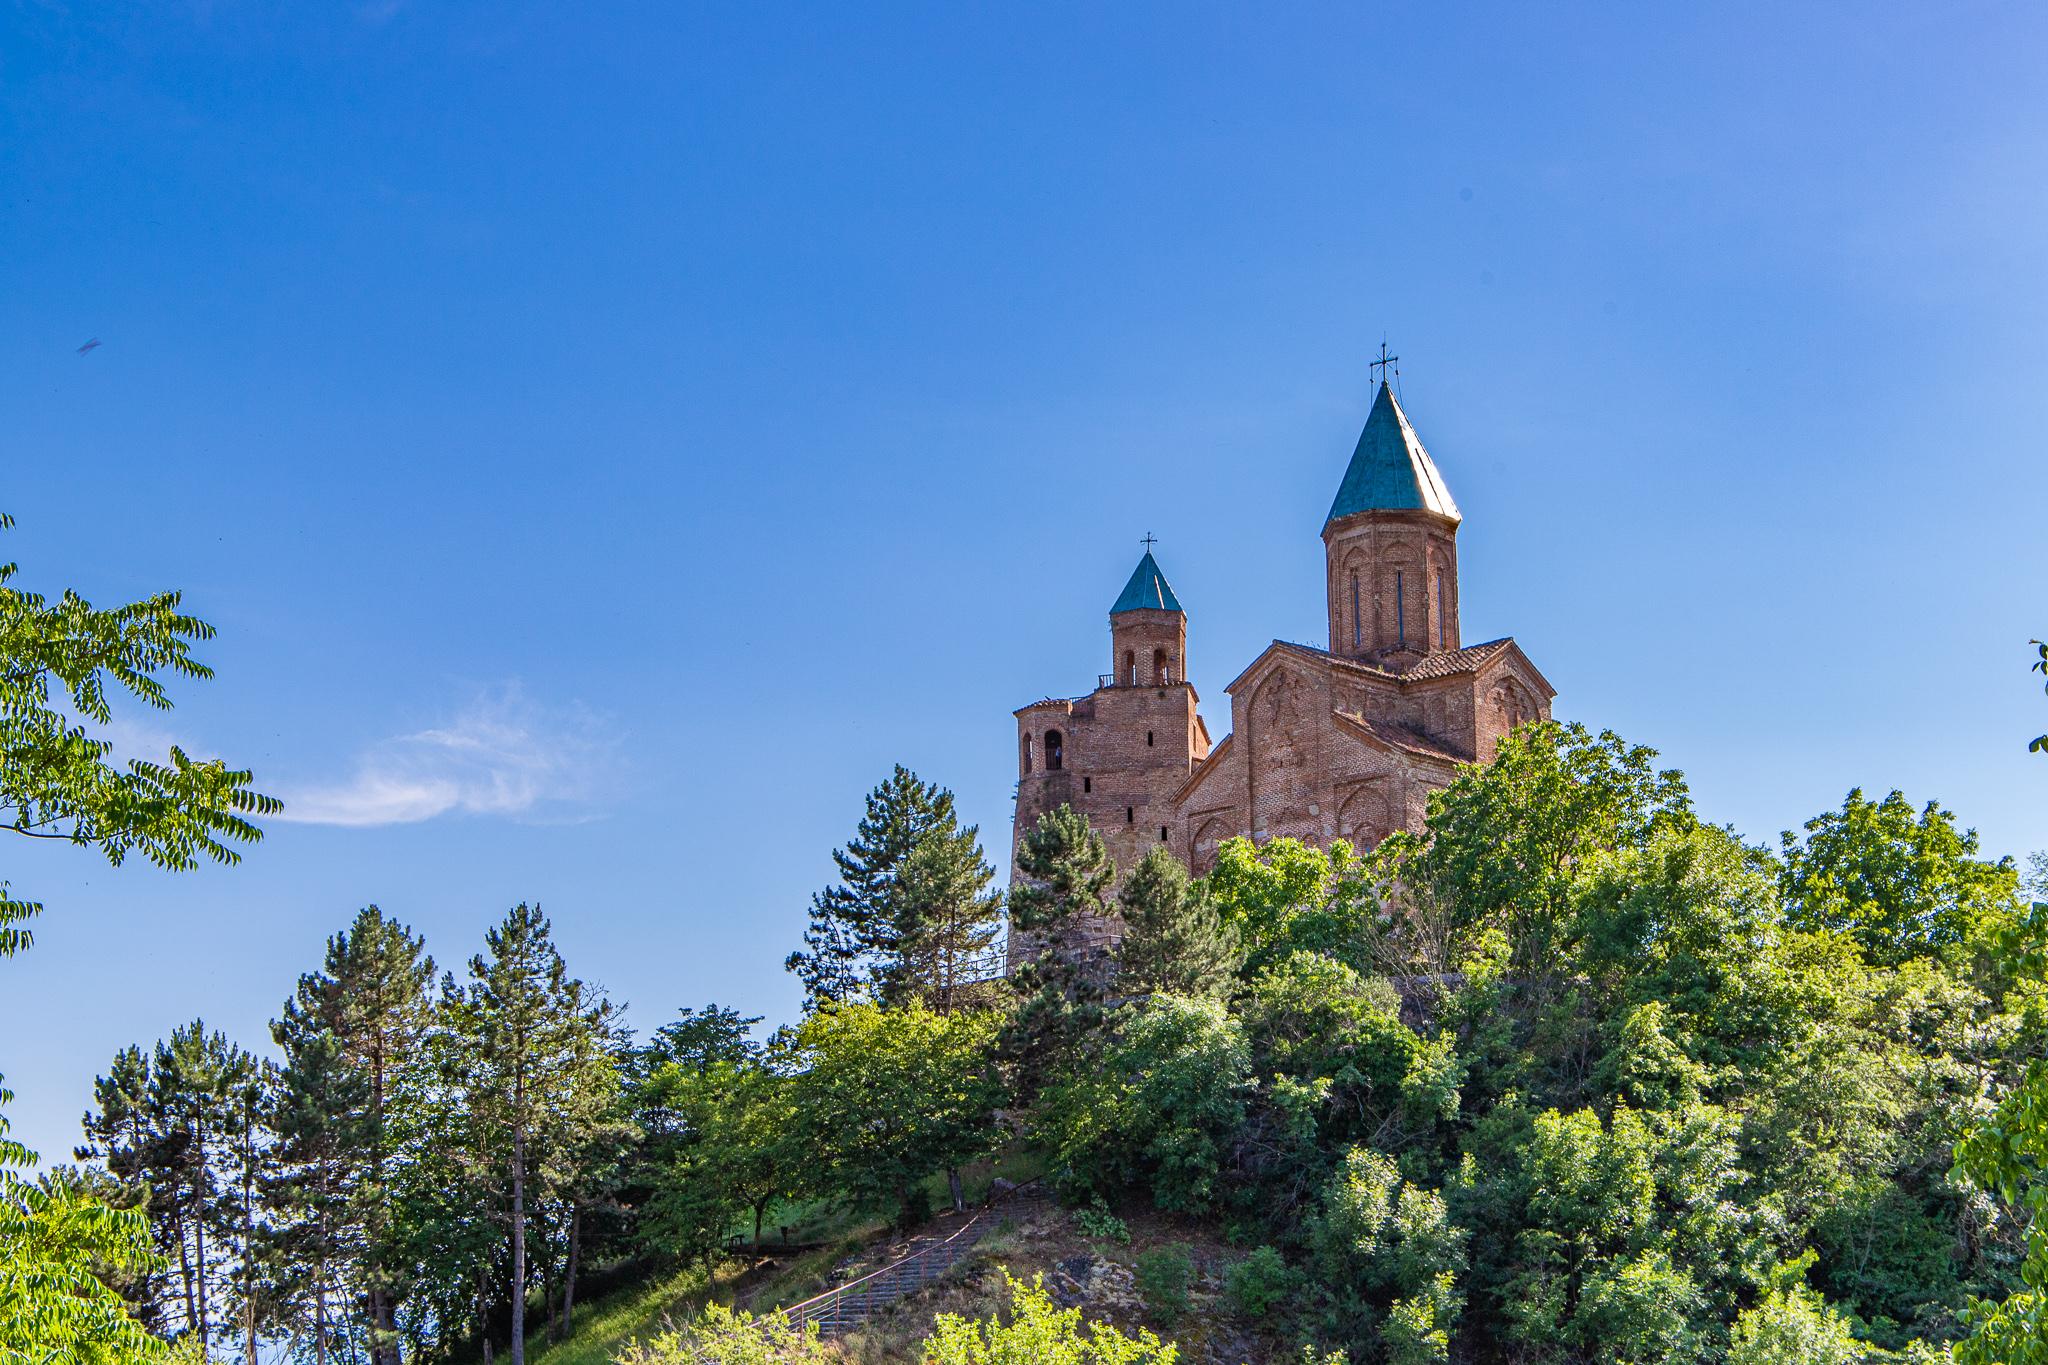 The Archangels Church